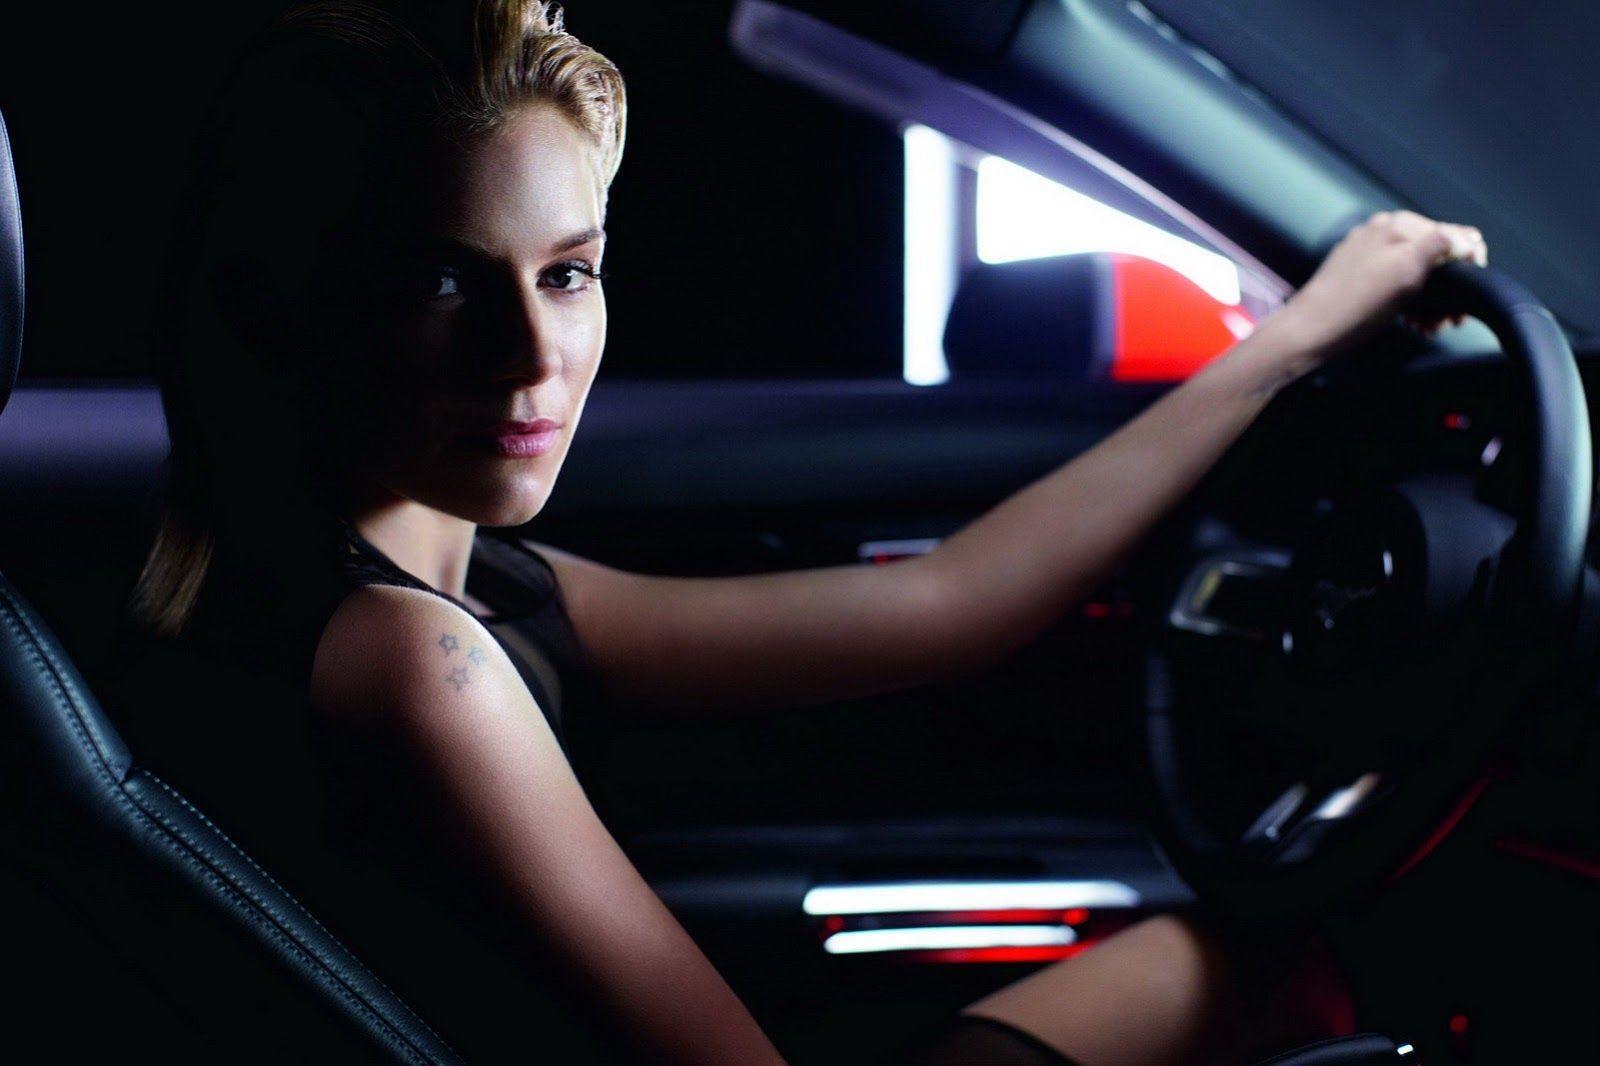 Картинки гейтс, картинки девушка на машине за рулем